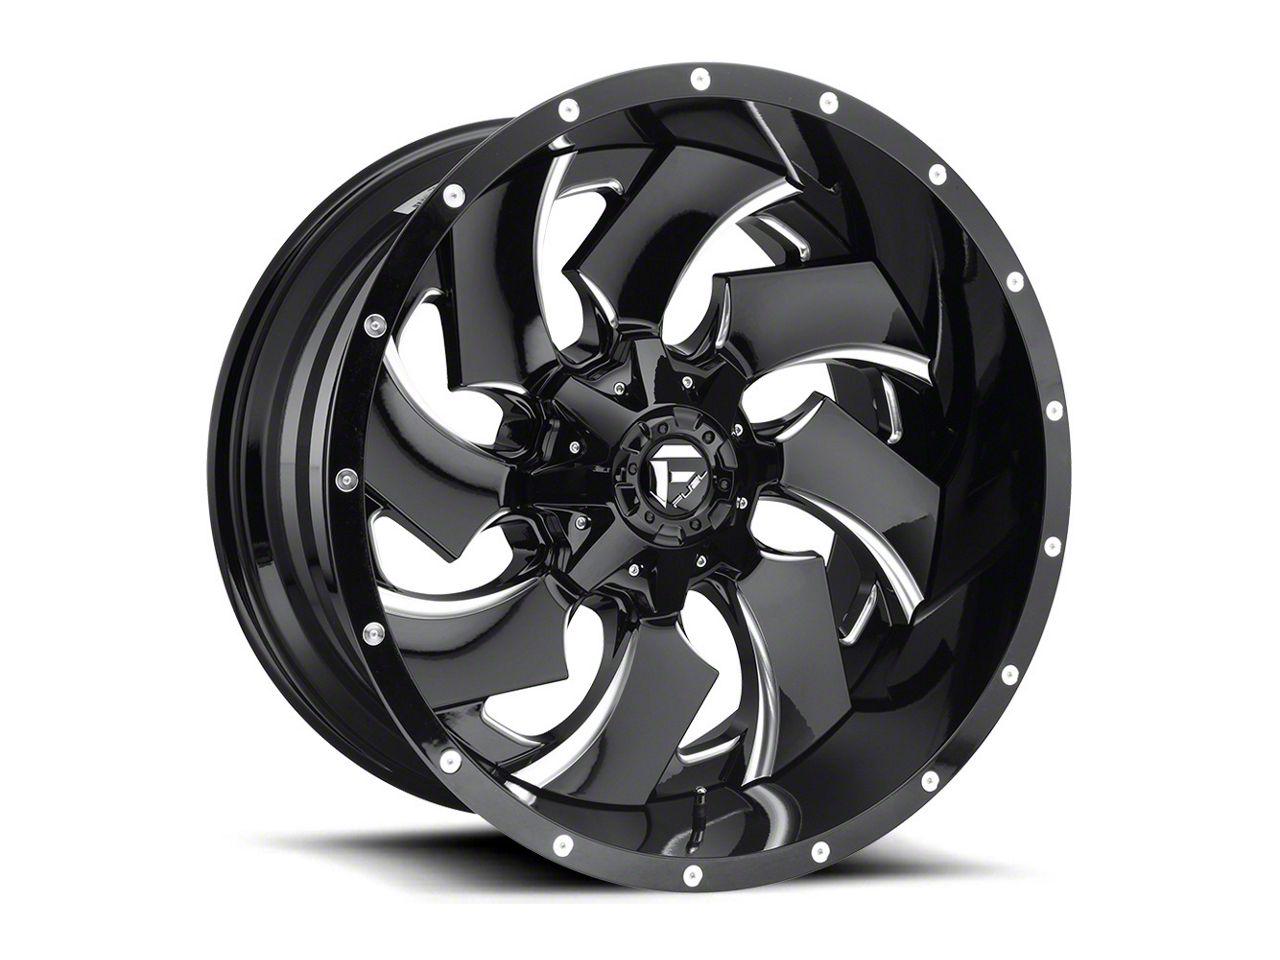 Fuel Wheels Cleaver Black Milled Wheel - 20x14 (87-06 Jeep Wrangler YJ & TJ)